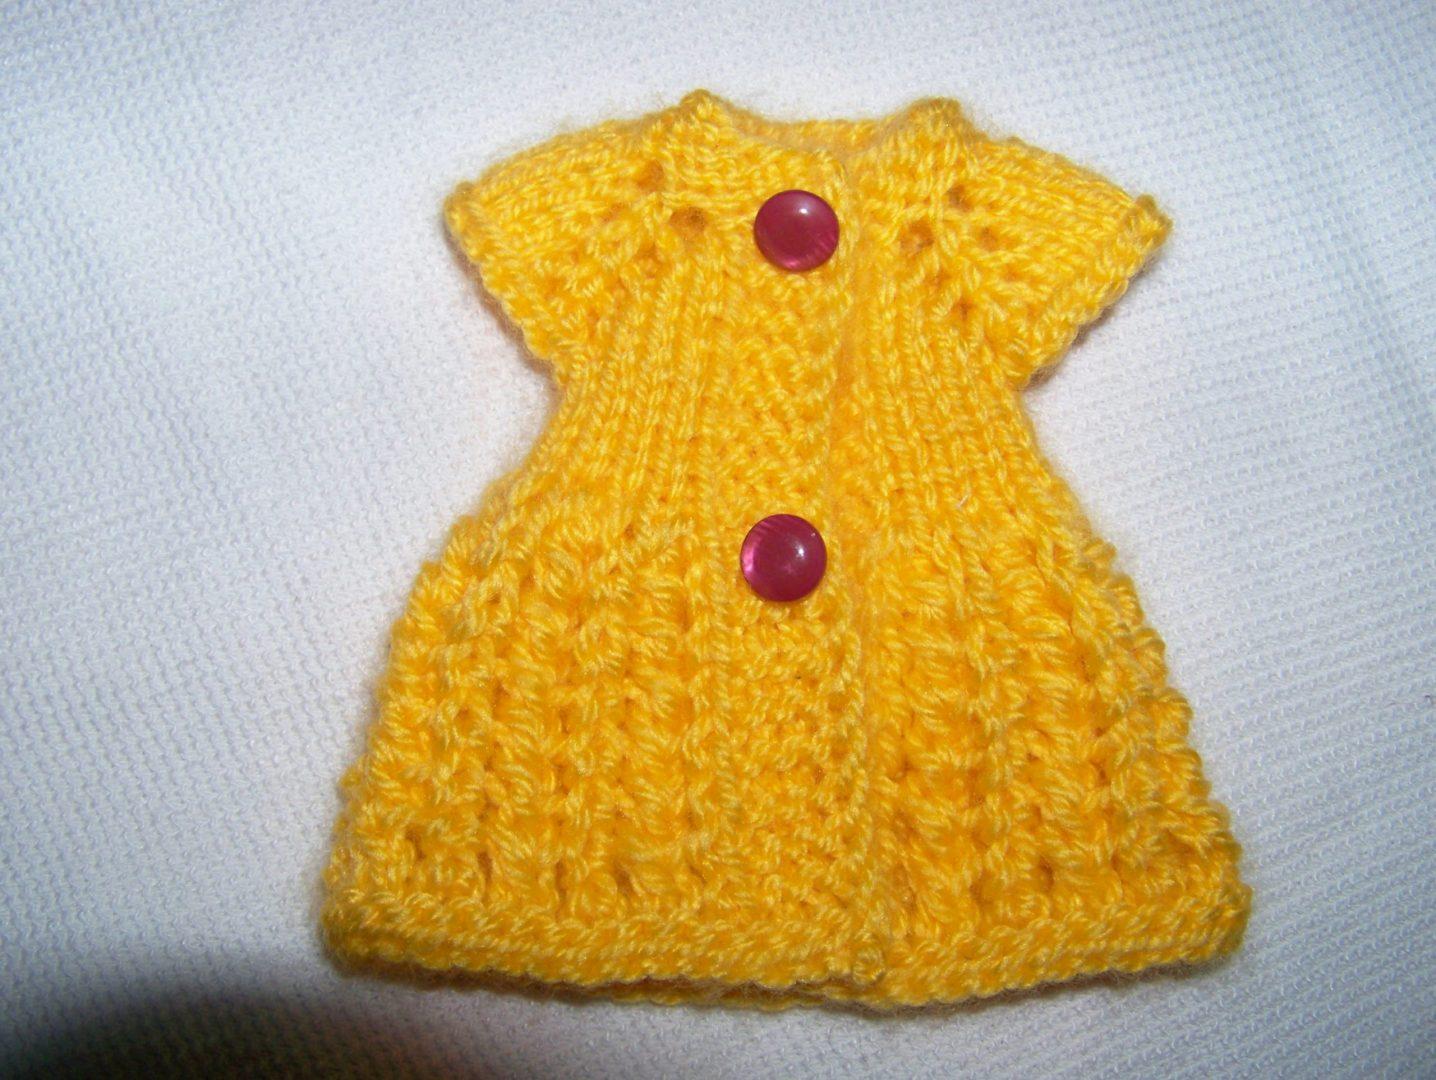 Knitted Toys & Amigurumi / Amigurumi bebek kıyafeti at sahibinden ... | 1080x1436